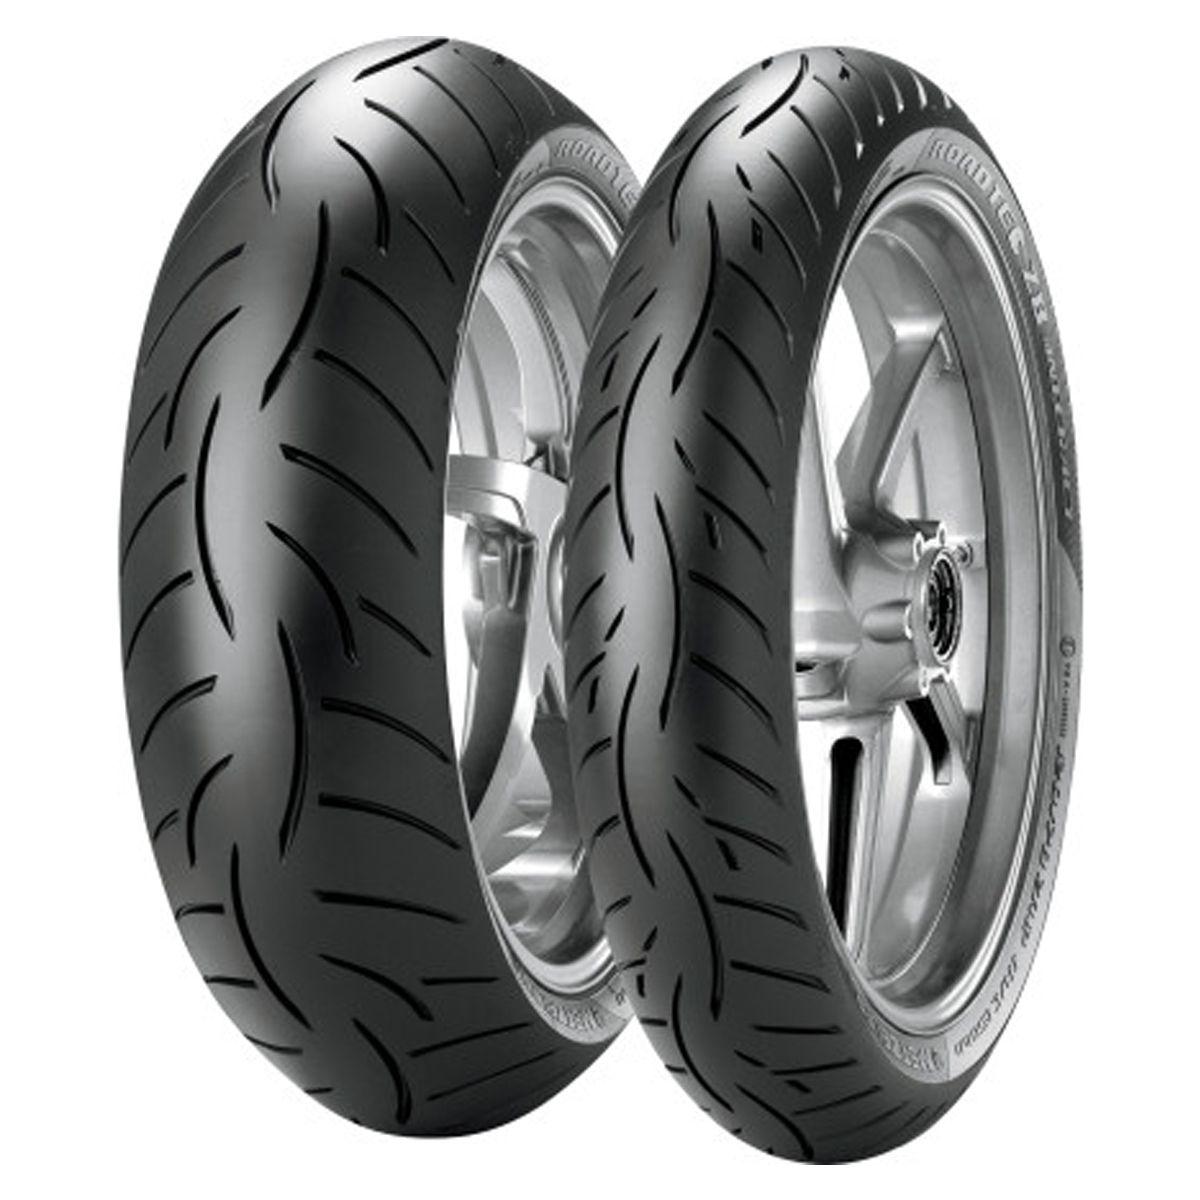 Metzeler Roadtec Interact Z8 Tire Review